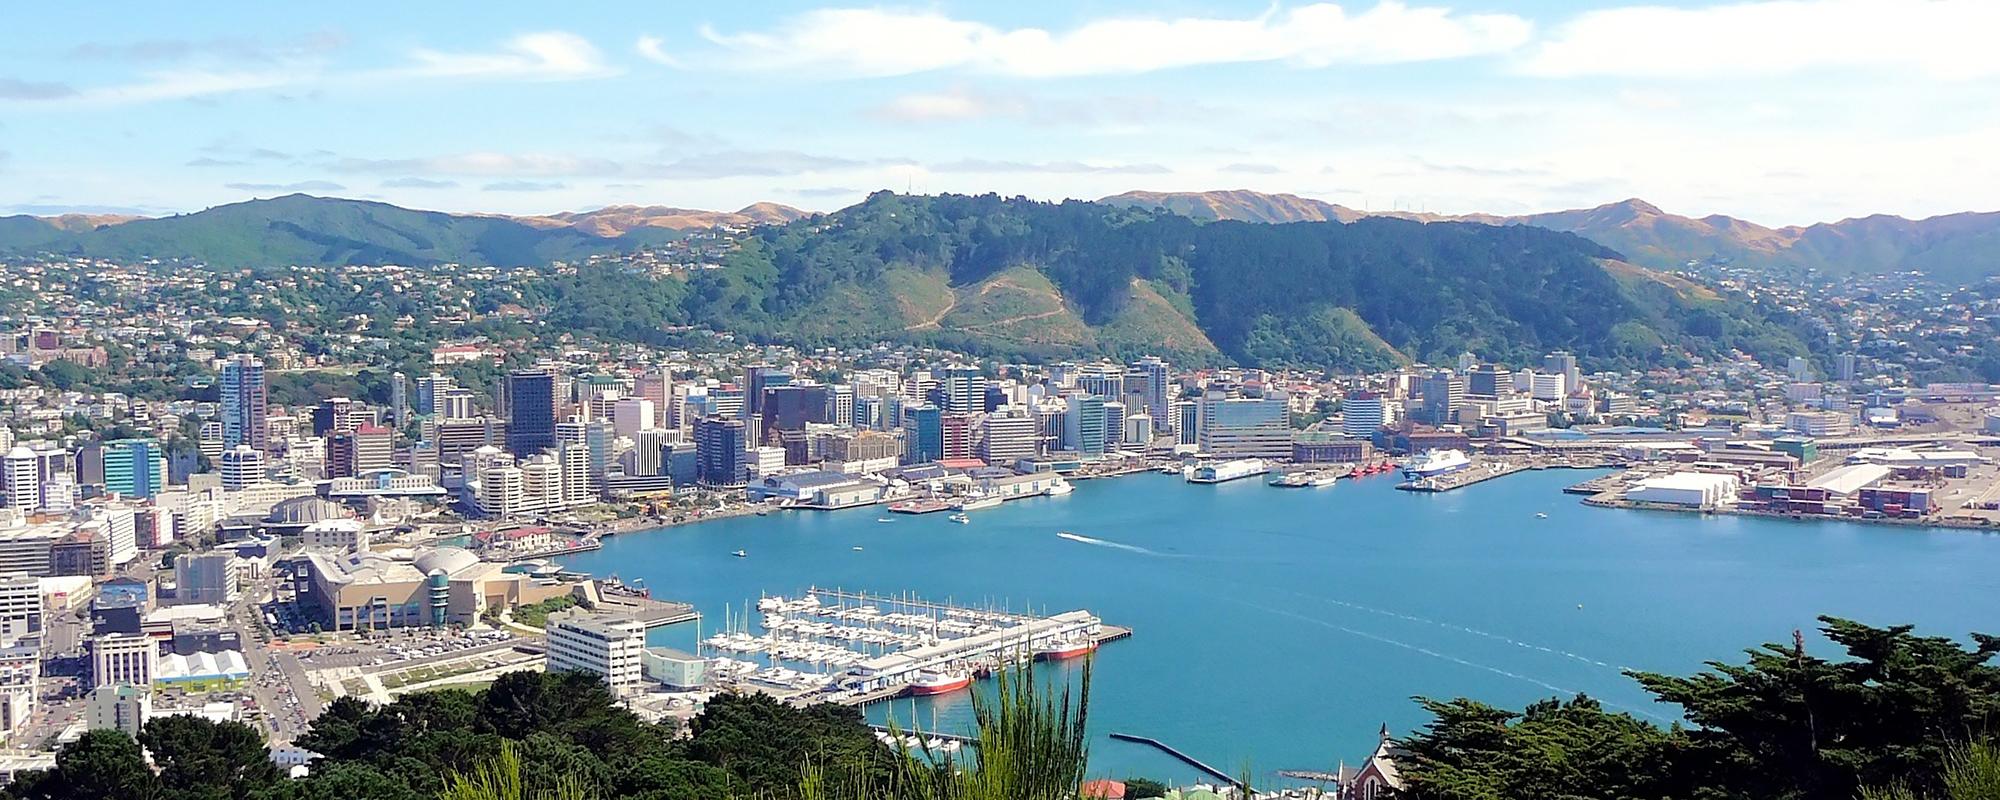 Central Wellington, New Zealand